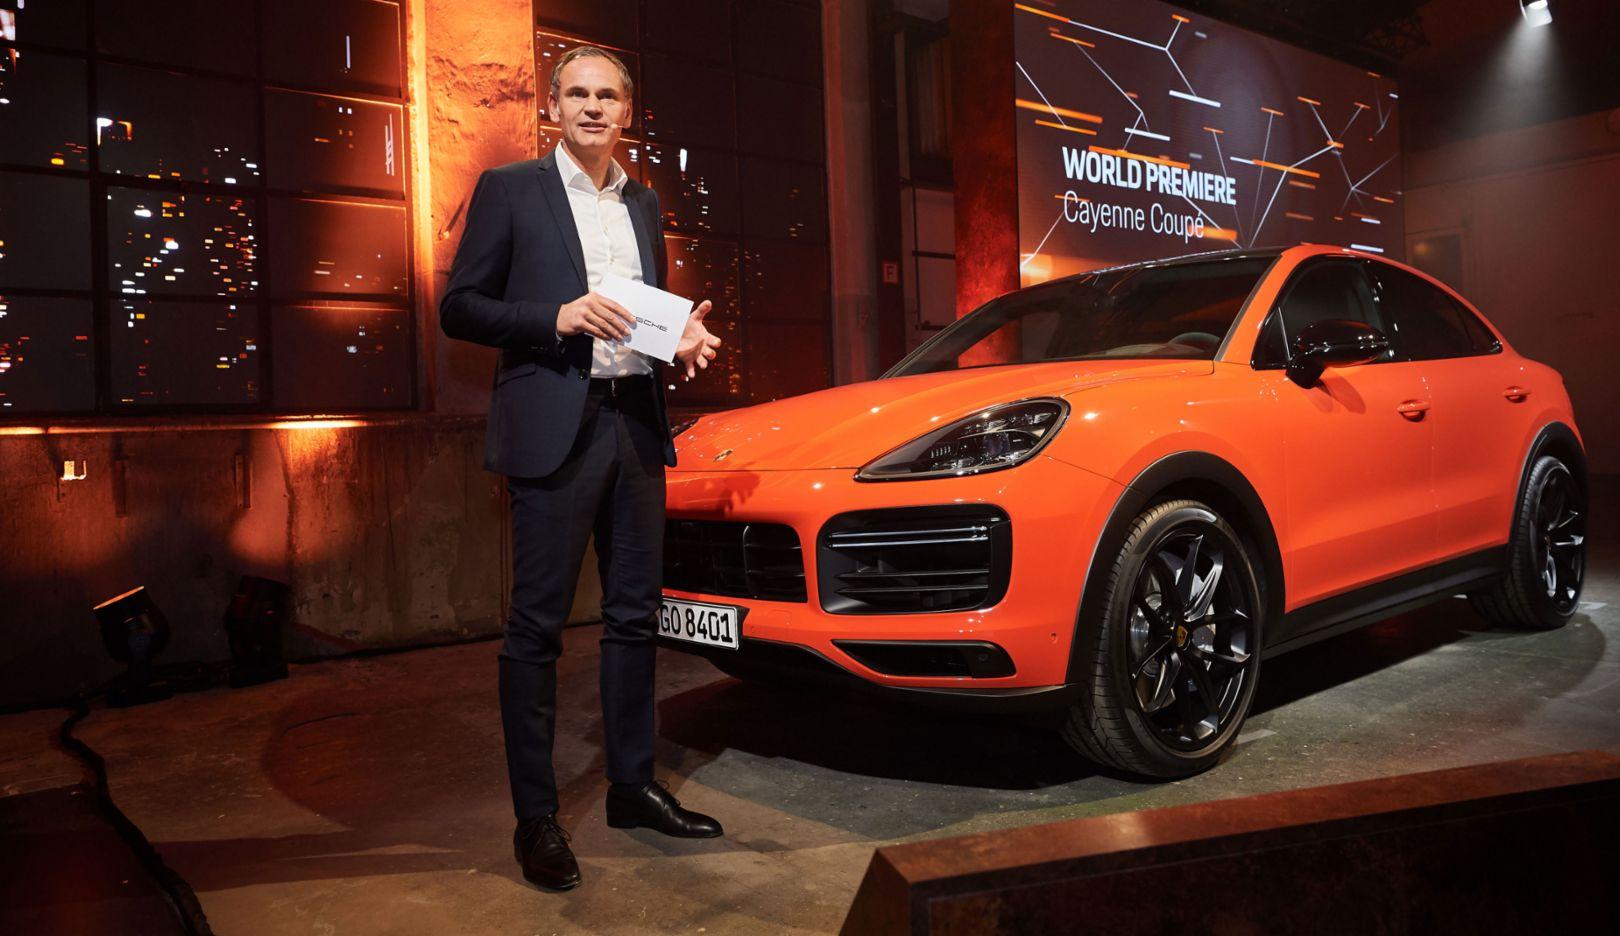 Oliver Blume, Chairman of the Executive Board of Porsche AG, world premiere of the new Porsche Cayenne Coupé, Stuttgart, 2019, Porsche AG